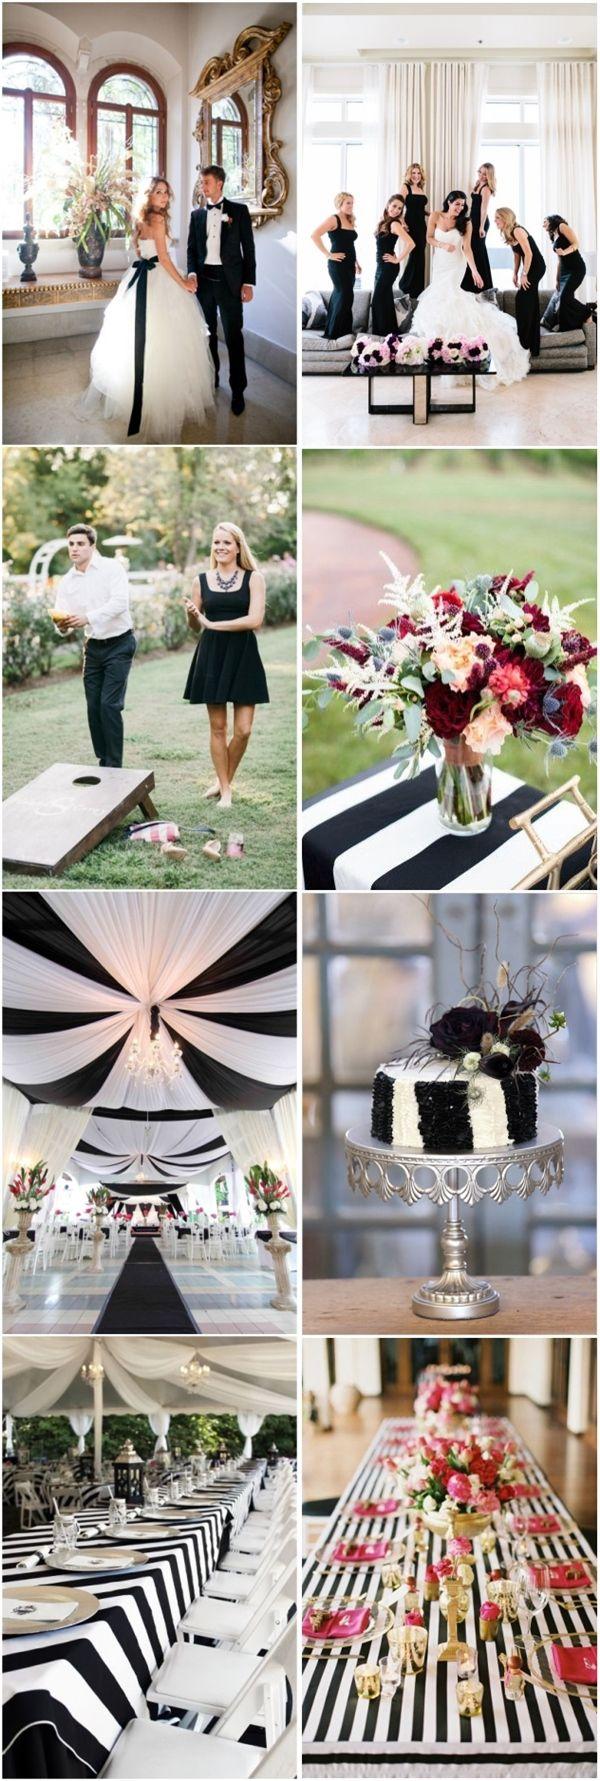 Black on black wedding decor   Black and White Wedding Ideas to Love  Weddings Wedding and Black